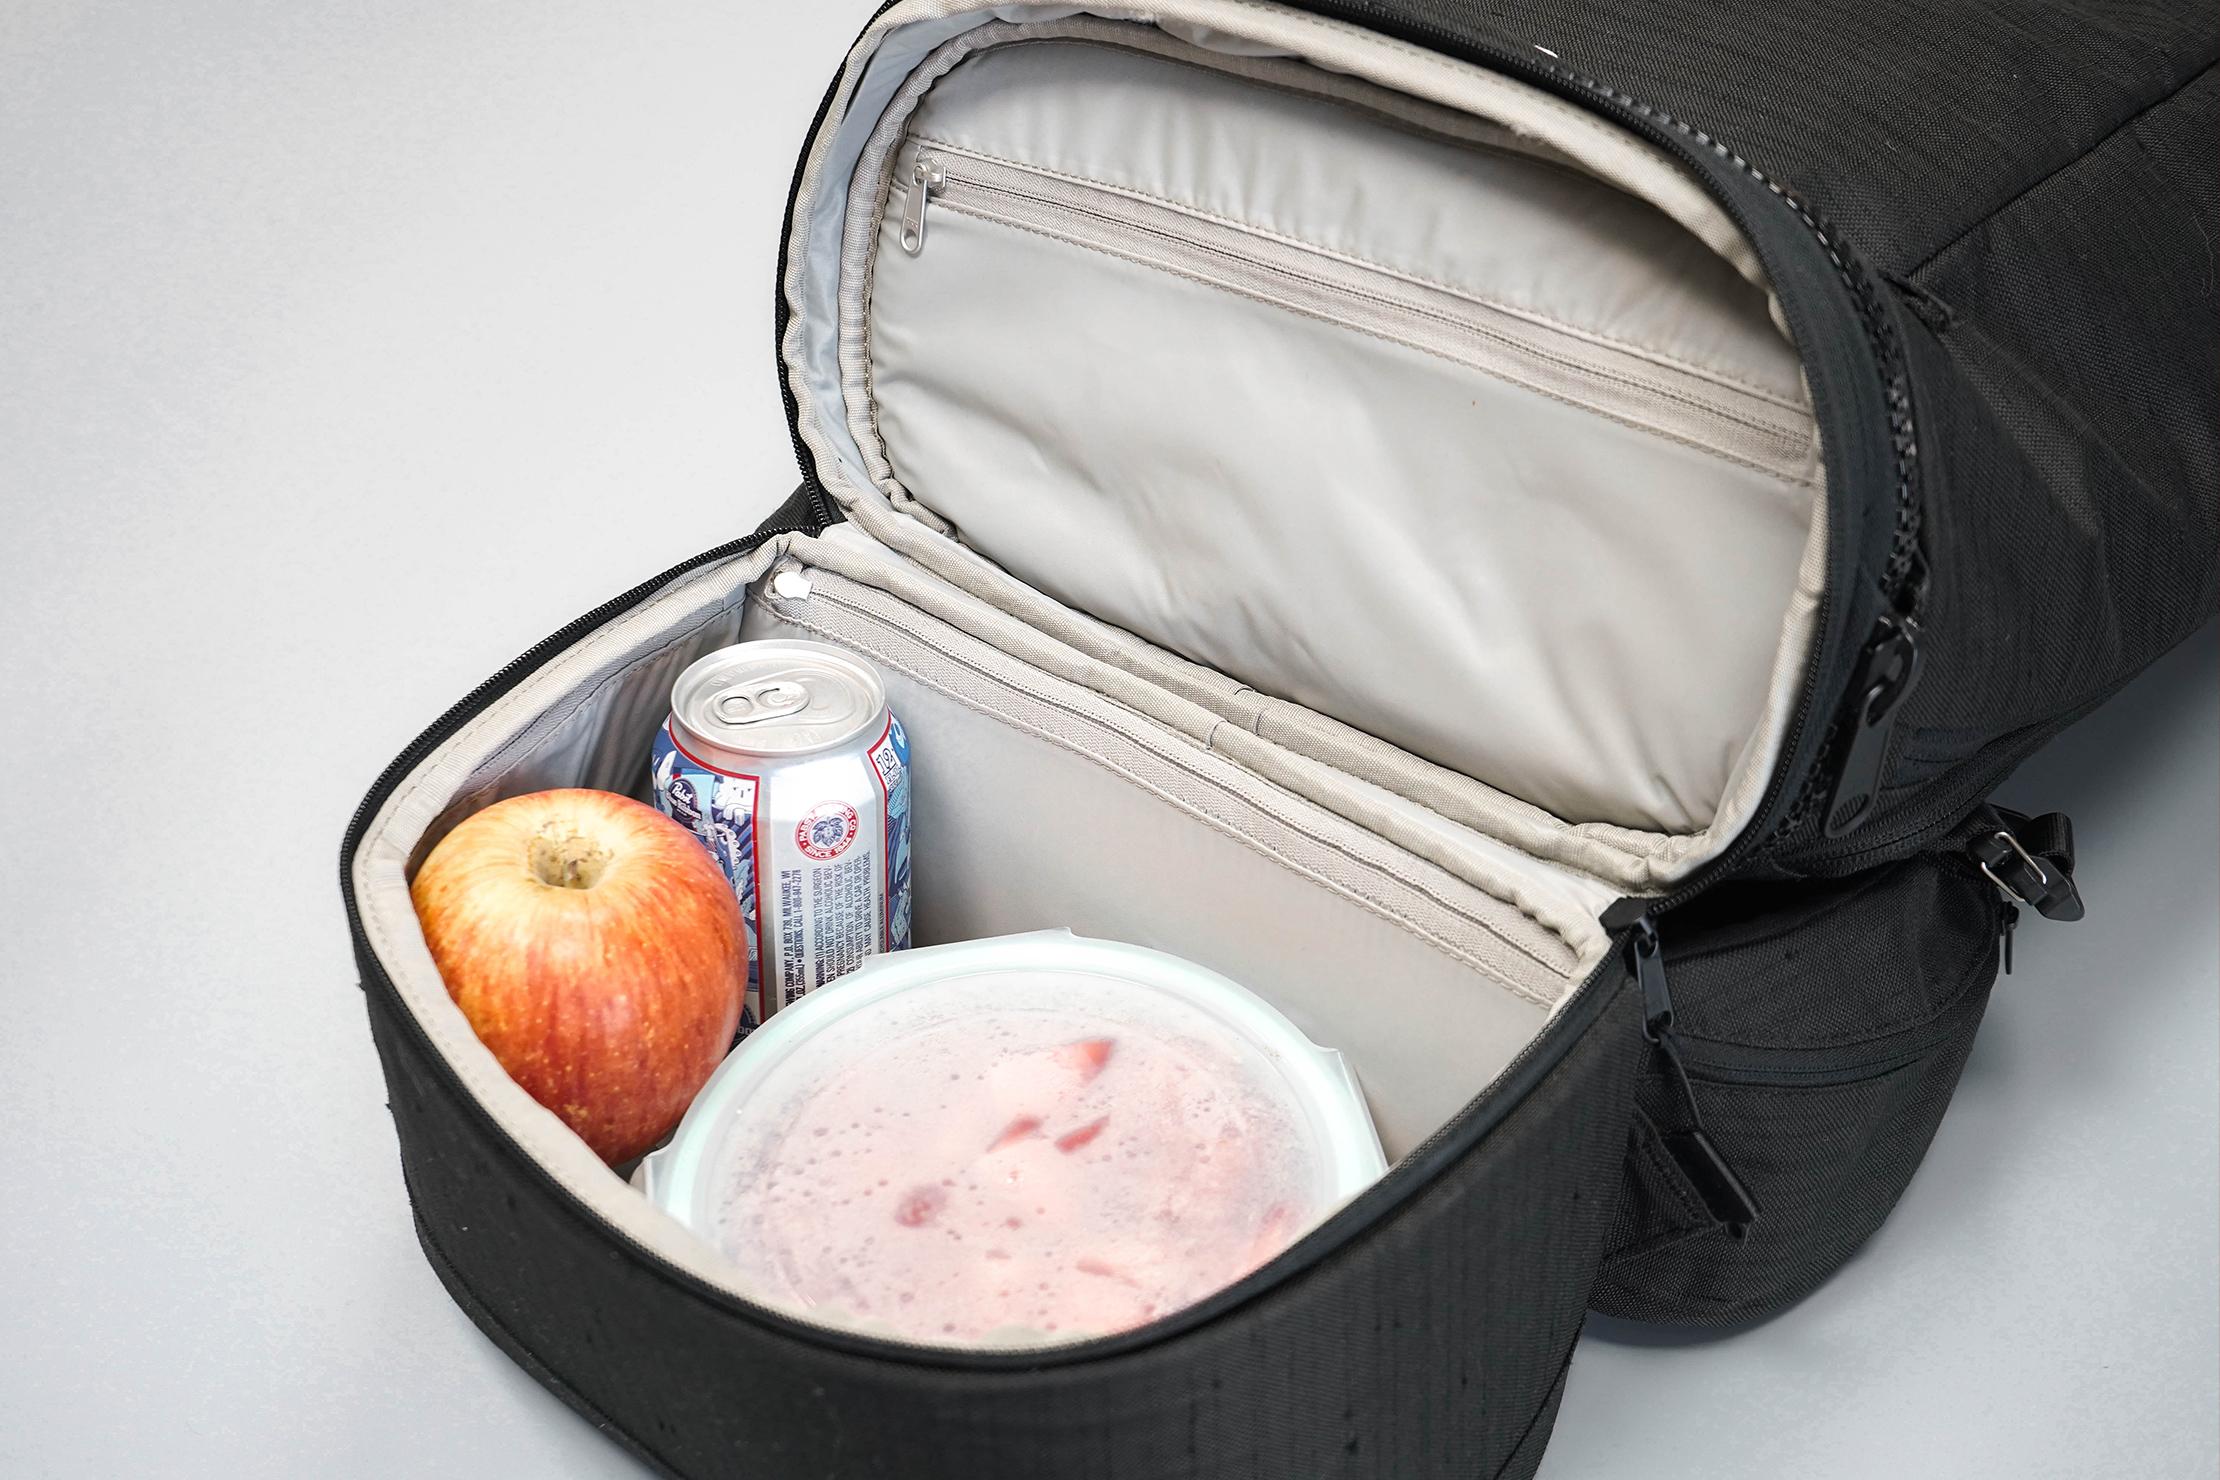 WAYKS ONE Bottom Lunchbox